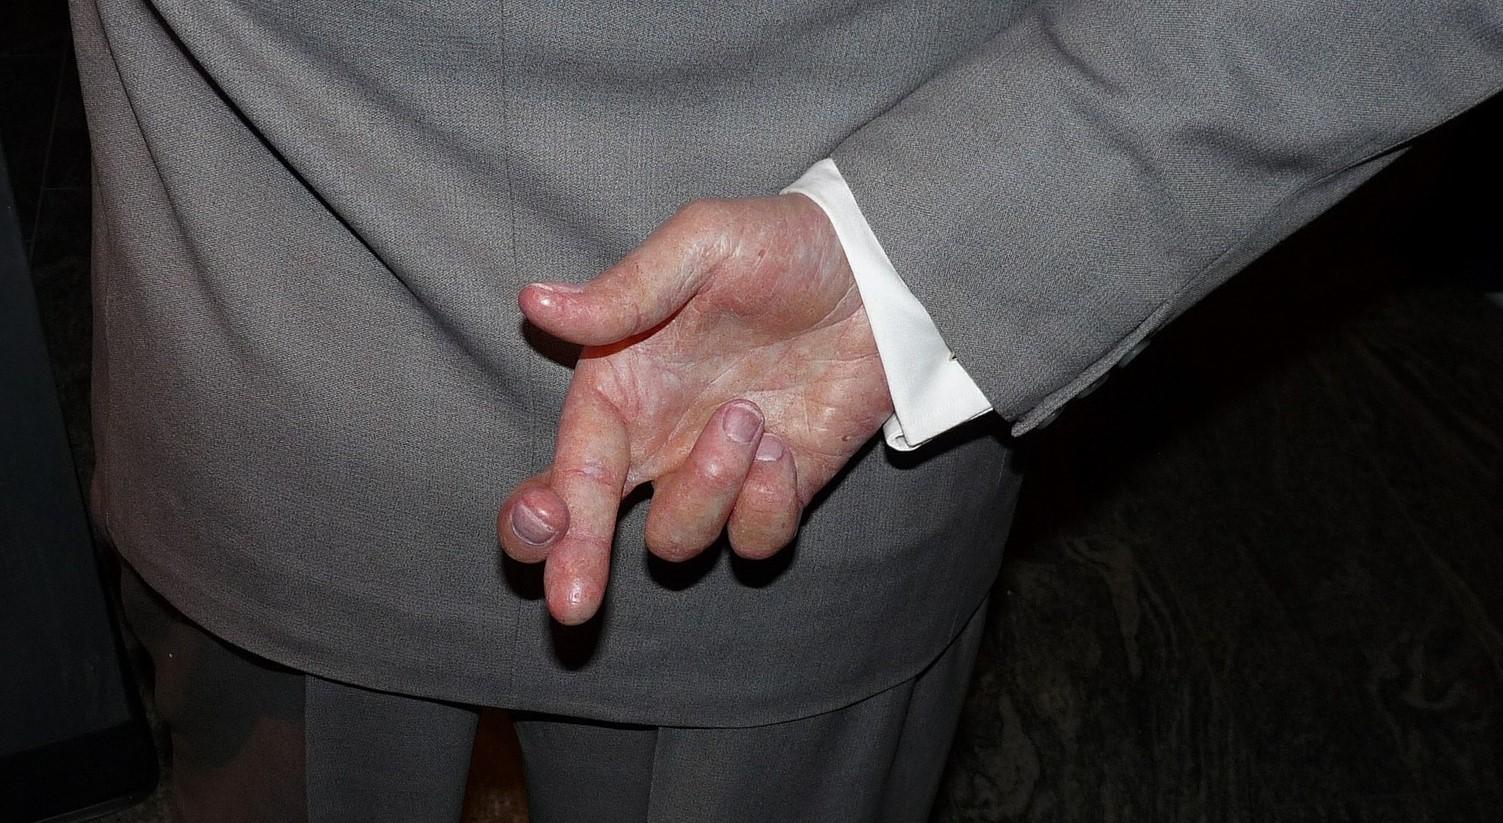 Pocket veto vingers gekruist